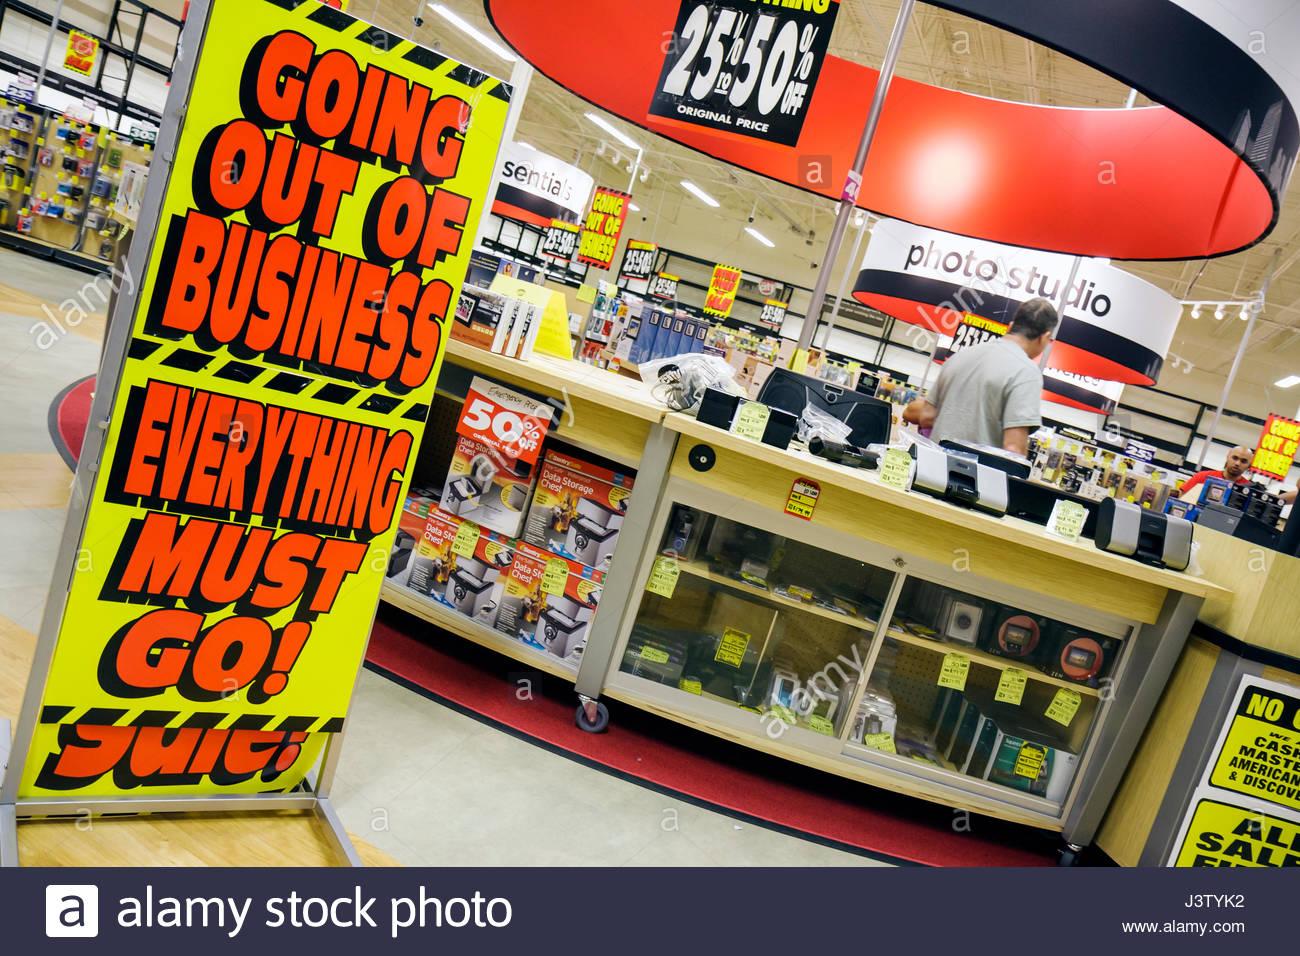 Port St Lucie Florida Saint Circuit City Retailer Consumer Electronics Going Out Of Business Sale